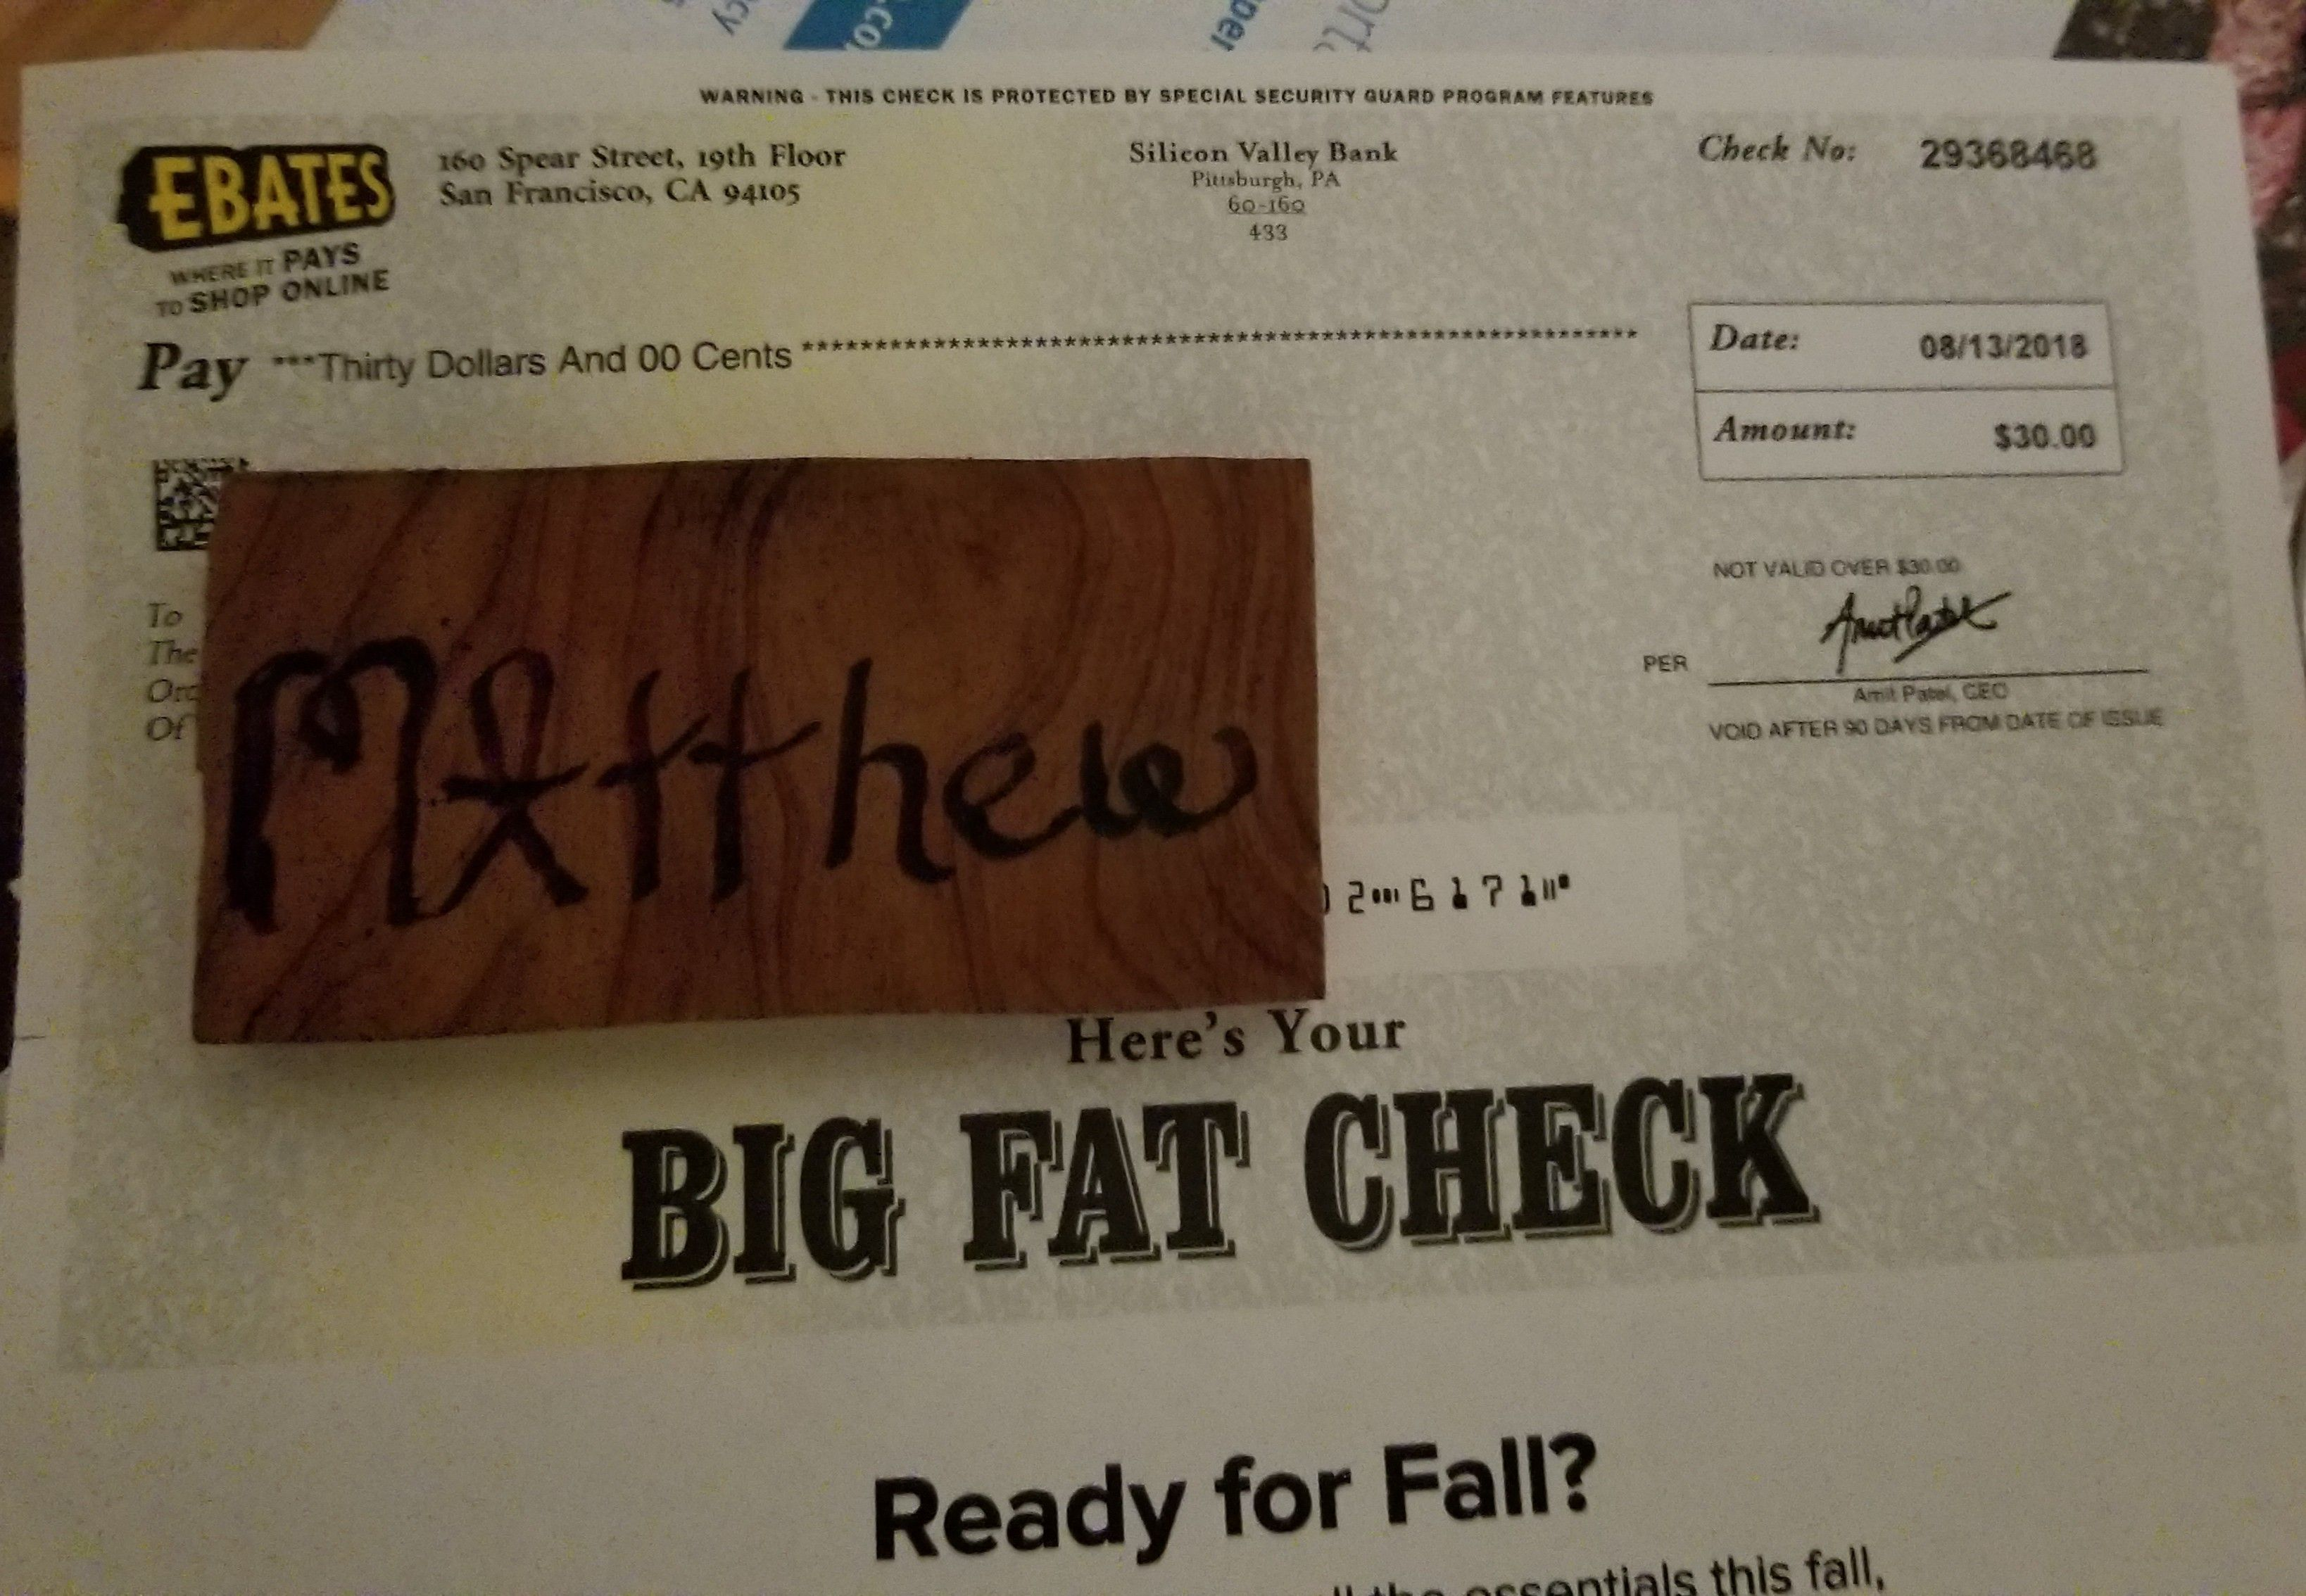 I just got my BigFatCheck from Ebates! With my online